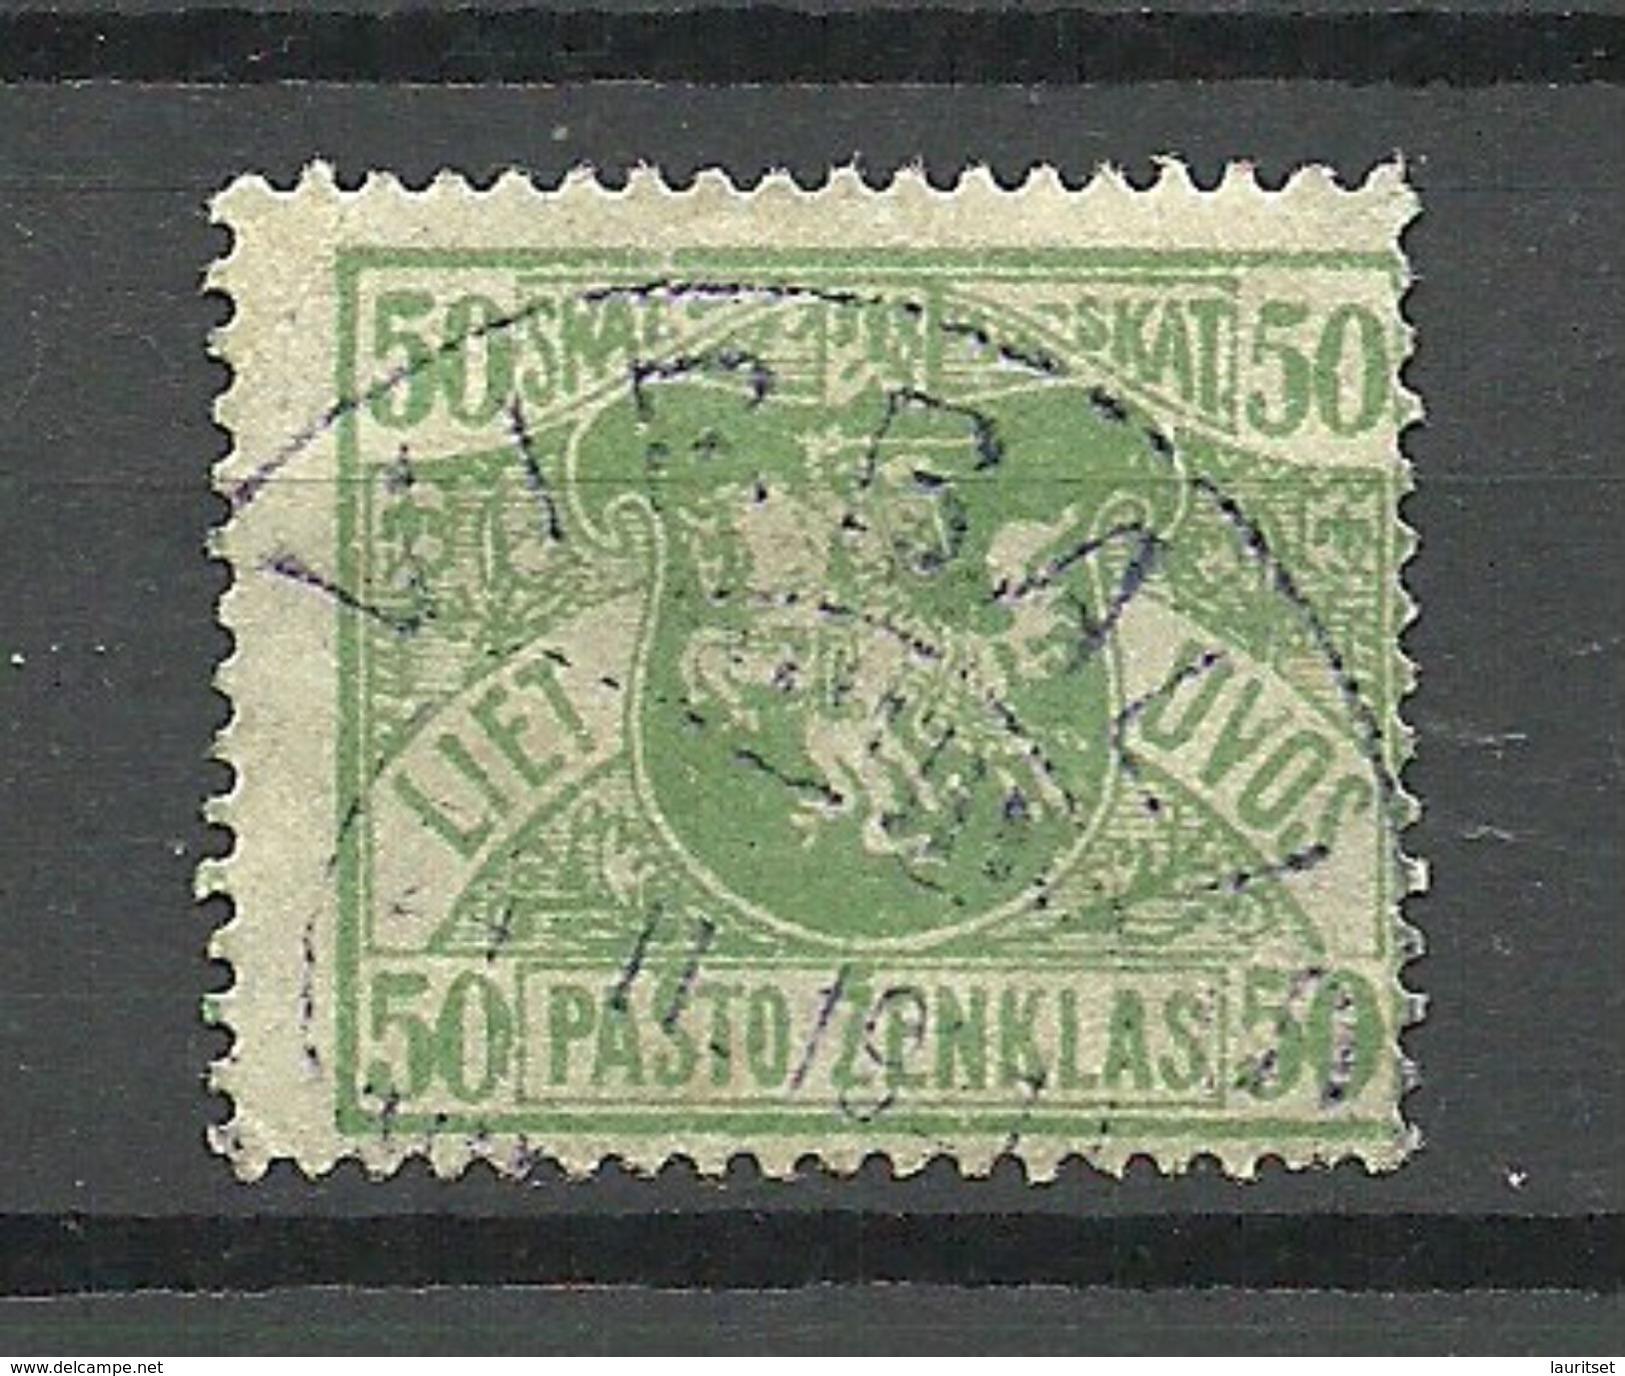 LITAUEN Lithuania 1919 Michel 55 O VIRBALIS - Lithuania